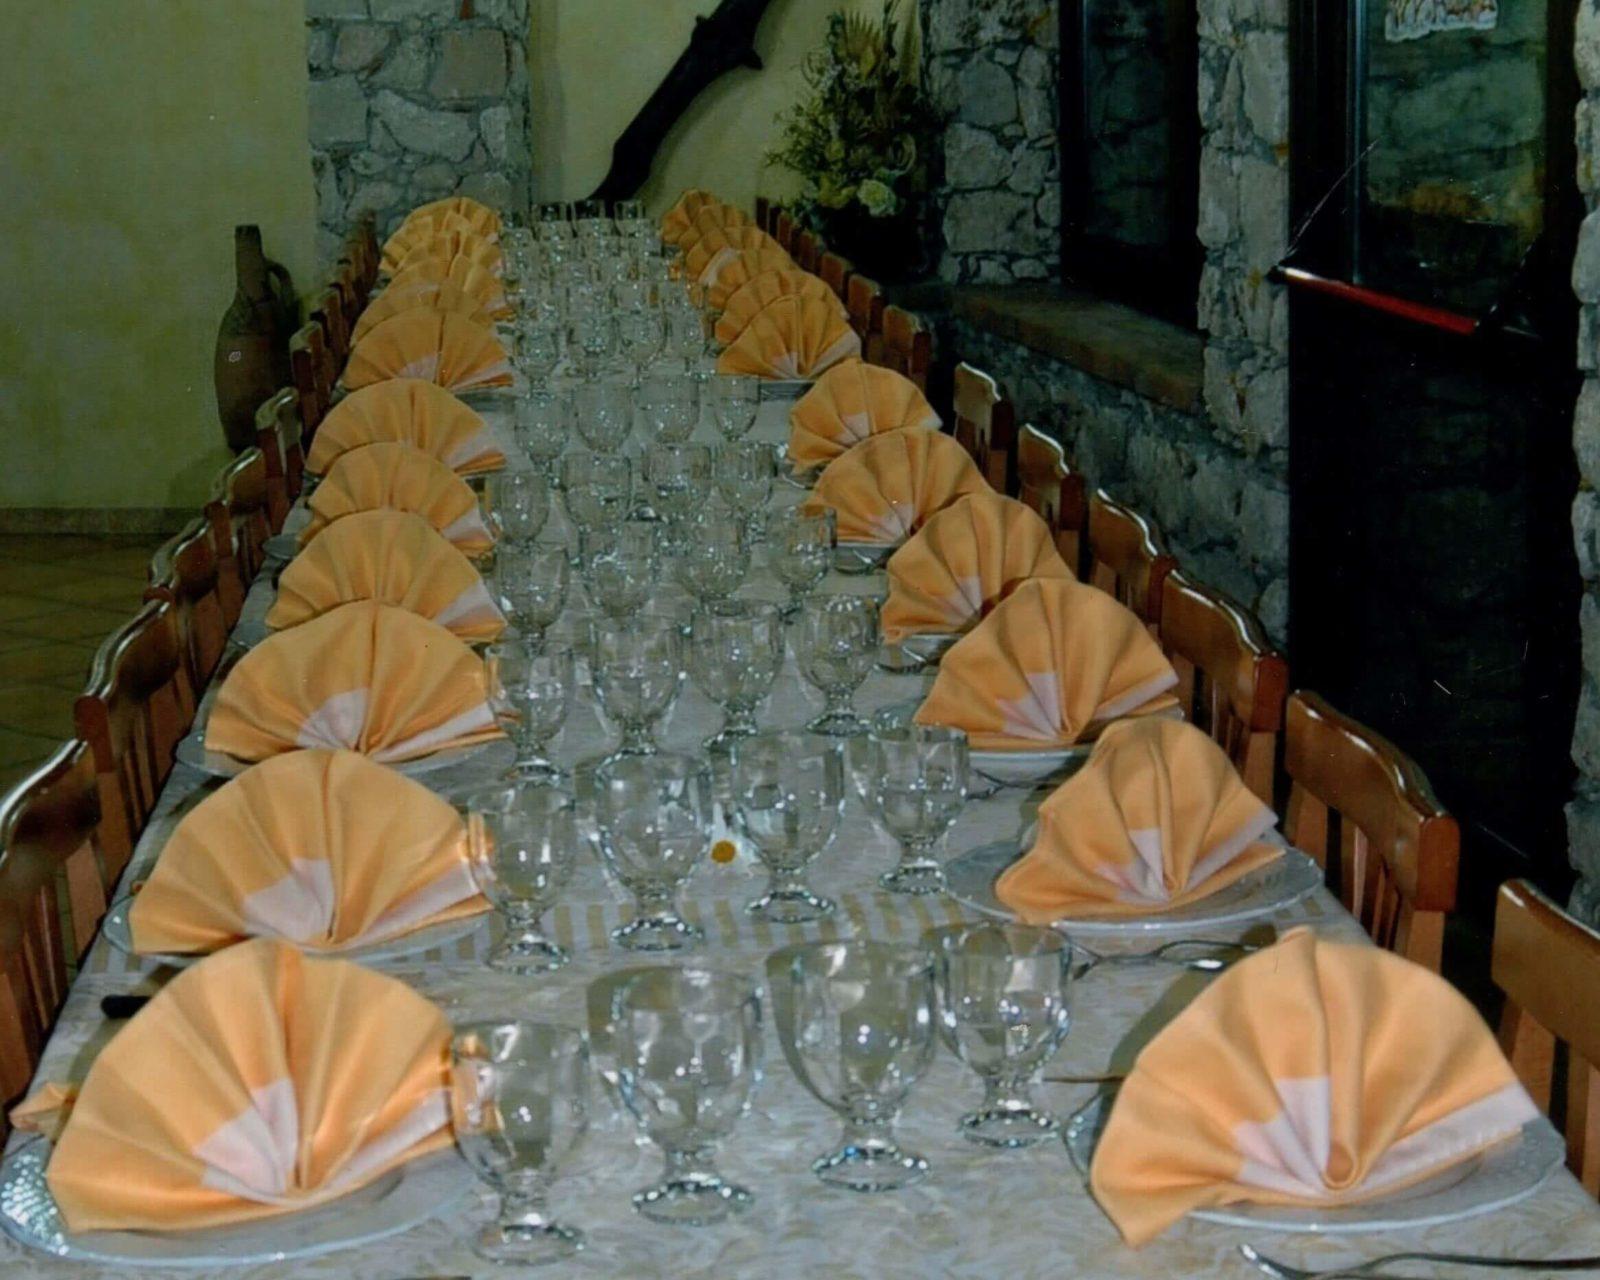 pranzo cena tavola apparecchiata